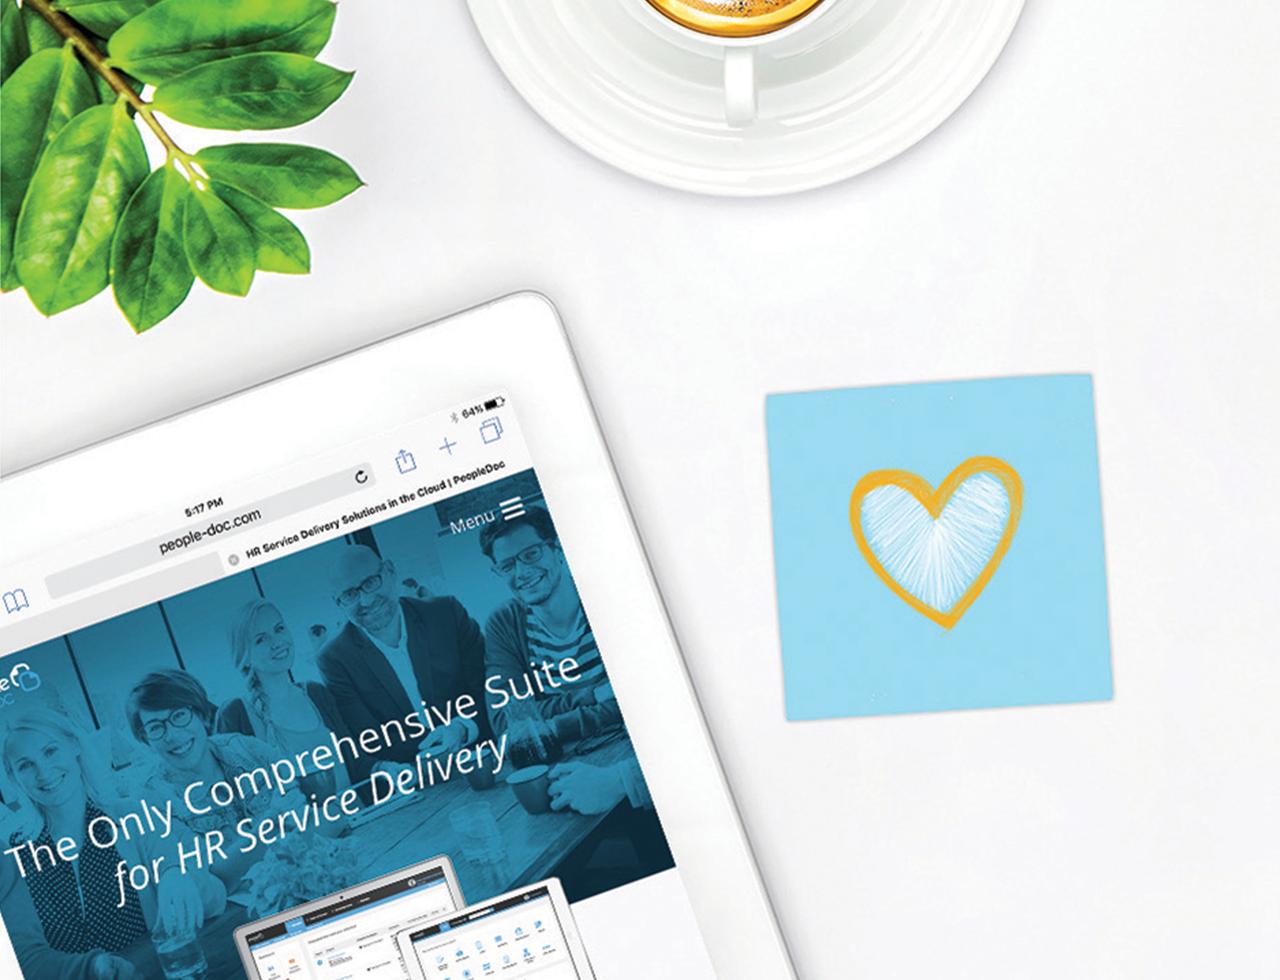 successconnect-blog-post-header_1.png